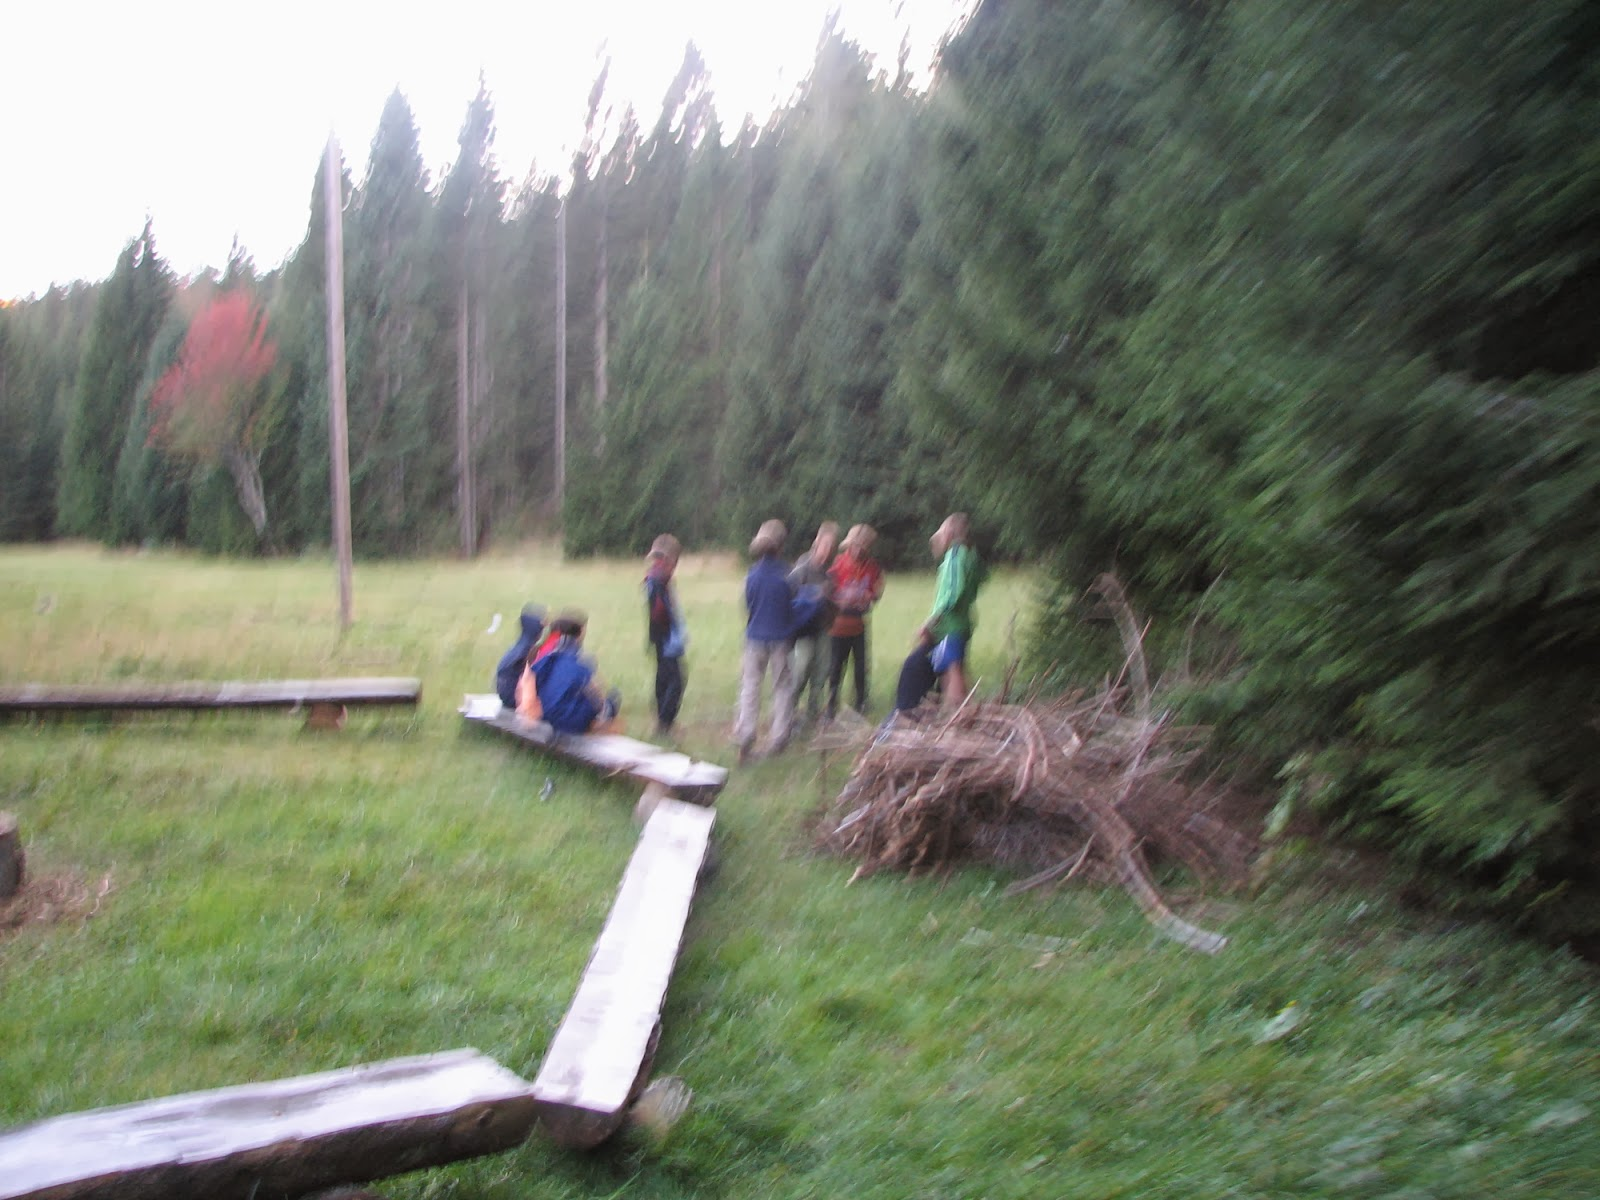 Vodov izlet, Ilirska Bistrica 2005 - Picture%2B251.jpg